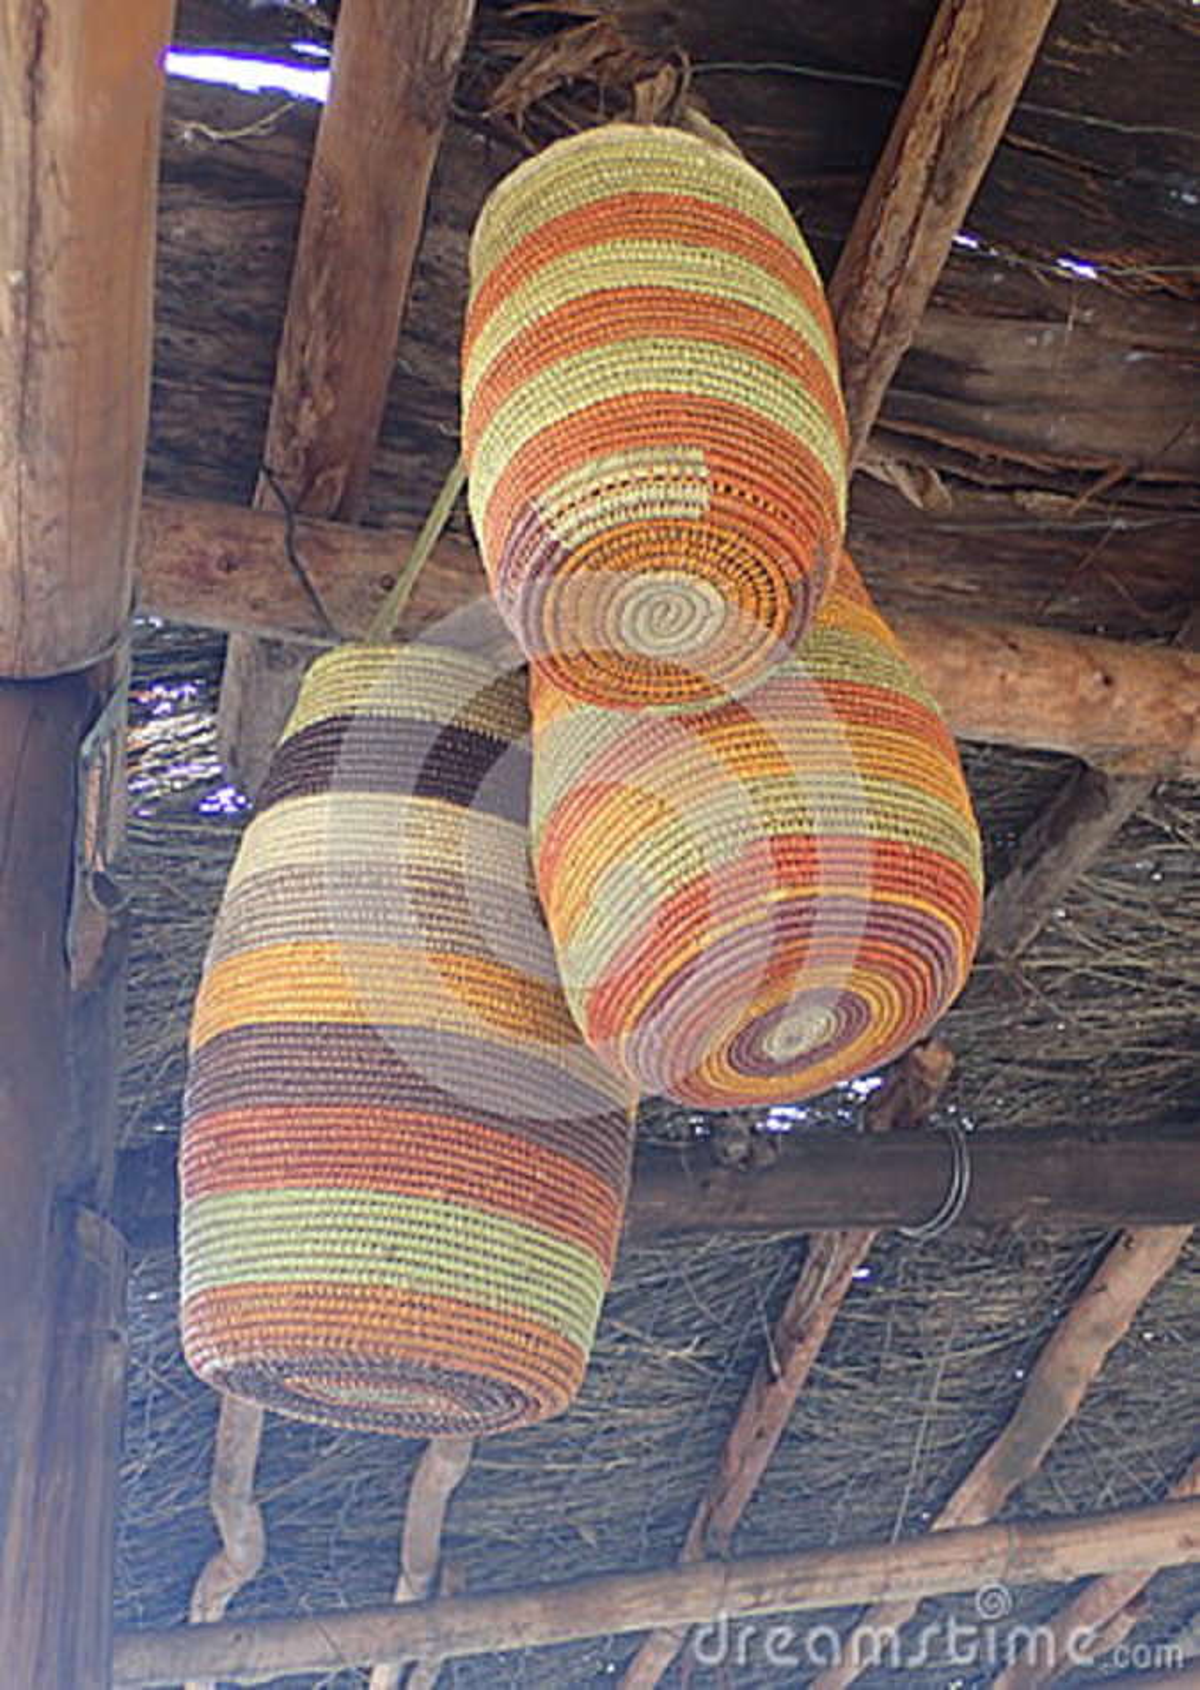 Indigenous Basket Weaving